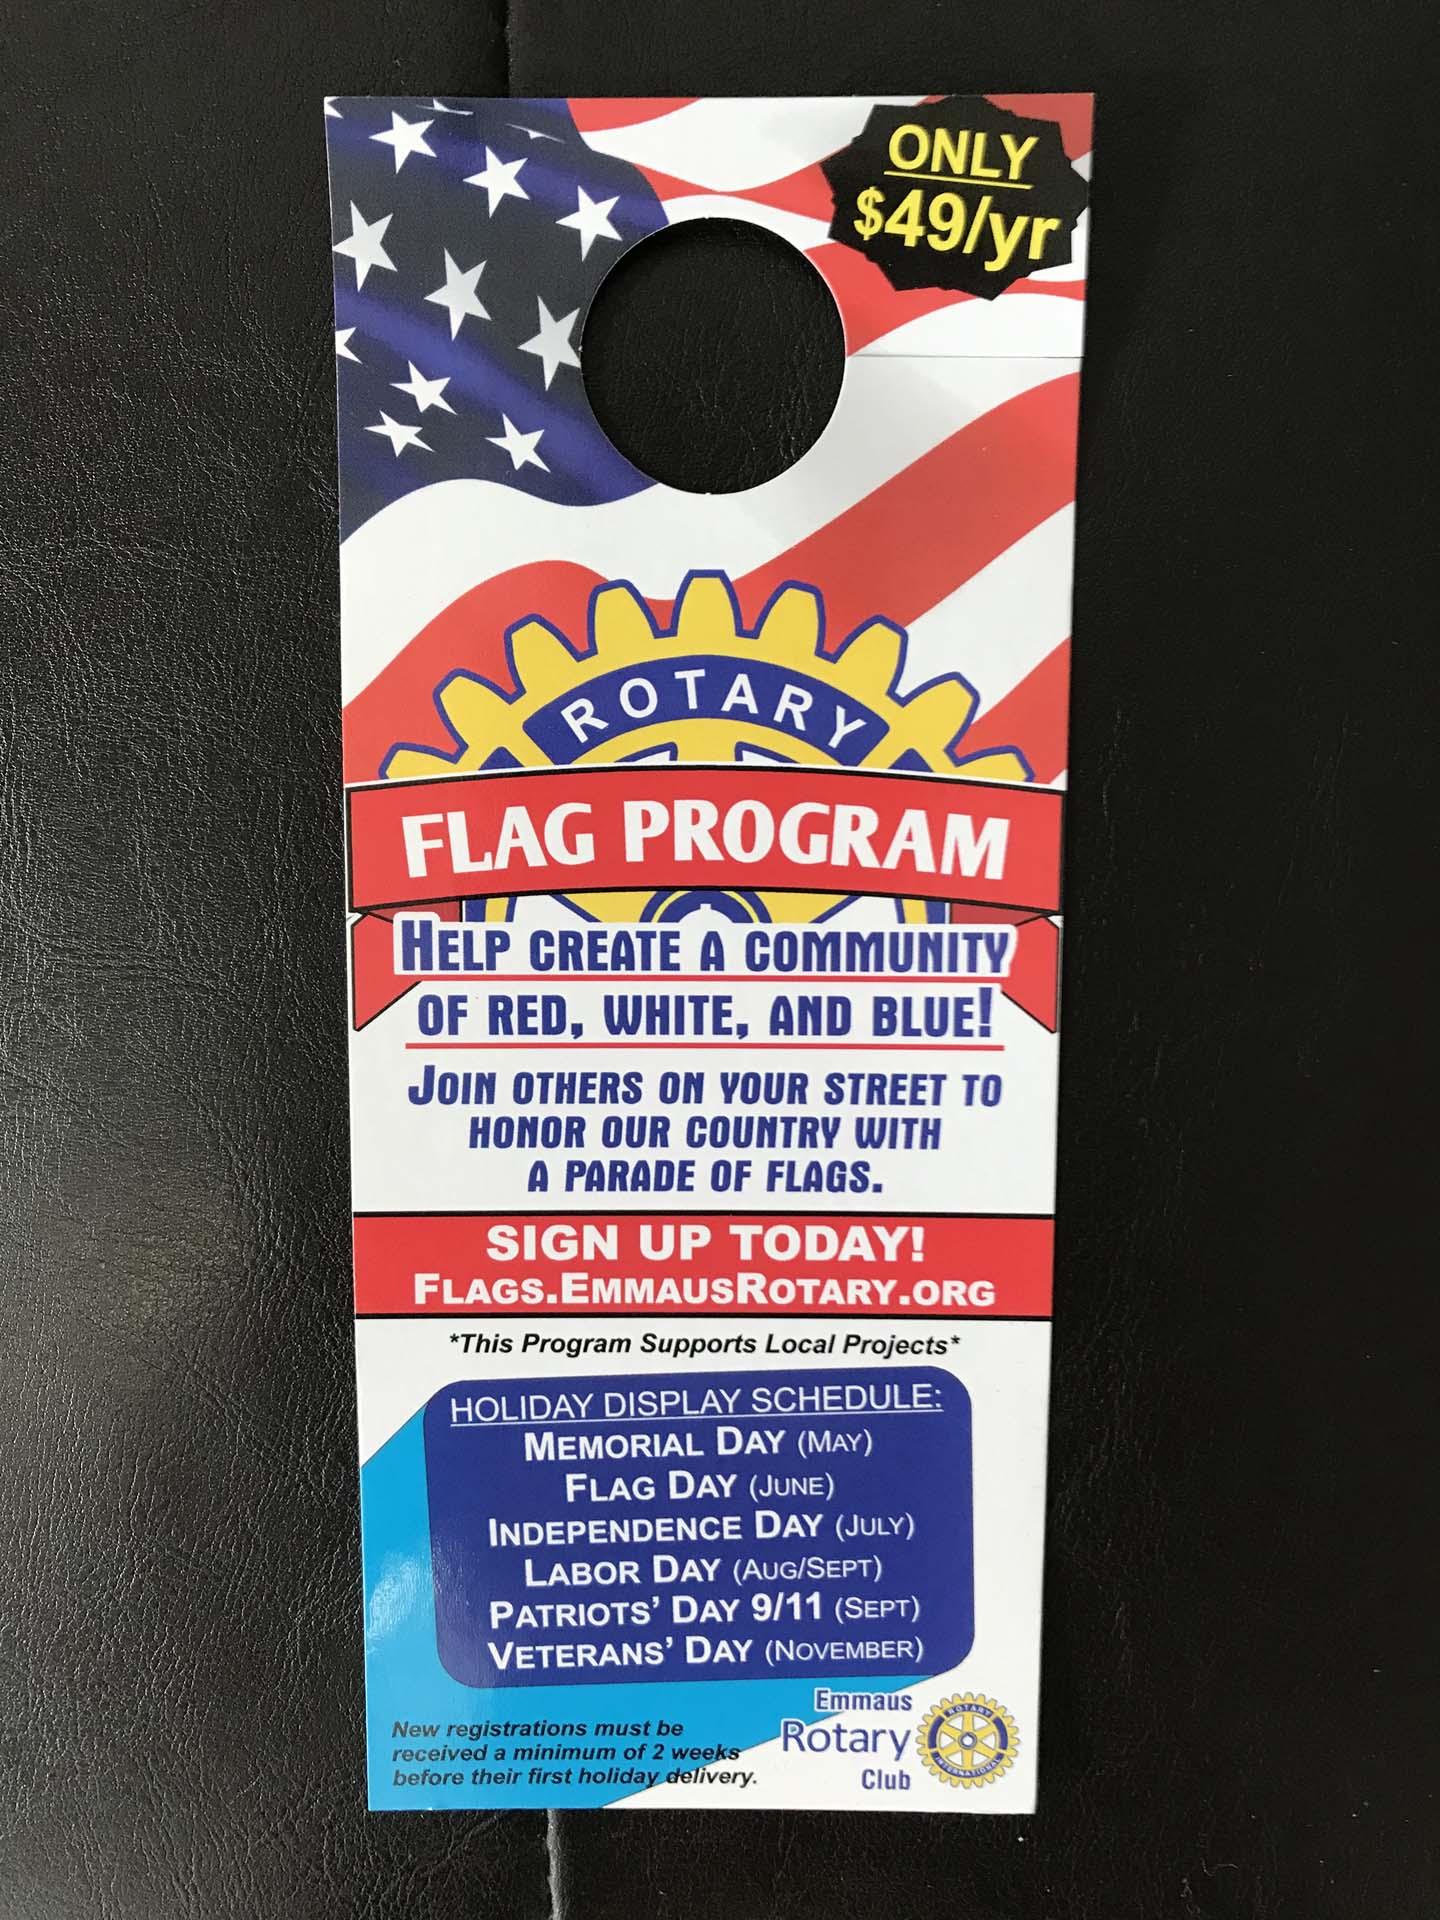 FlagProgram front